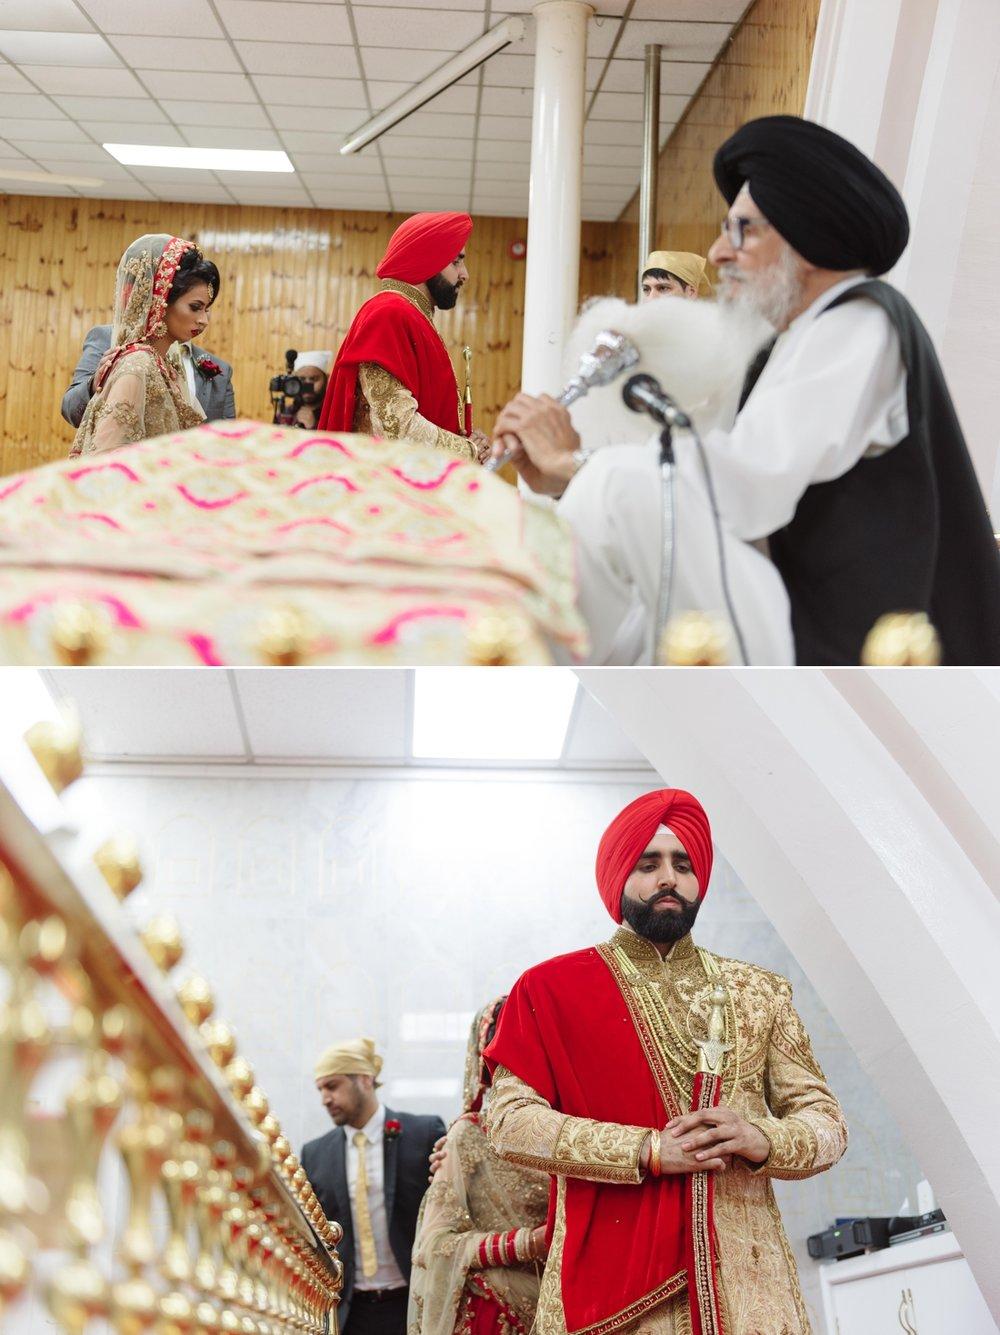 Gurpreet and Nick Sikh Wedding - Southampton - Photos by Abhi 11.jpg